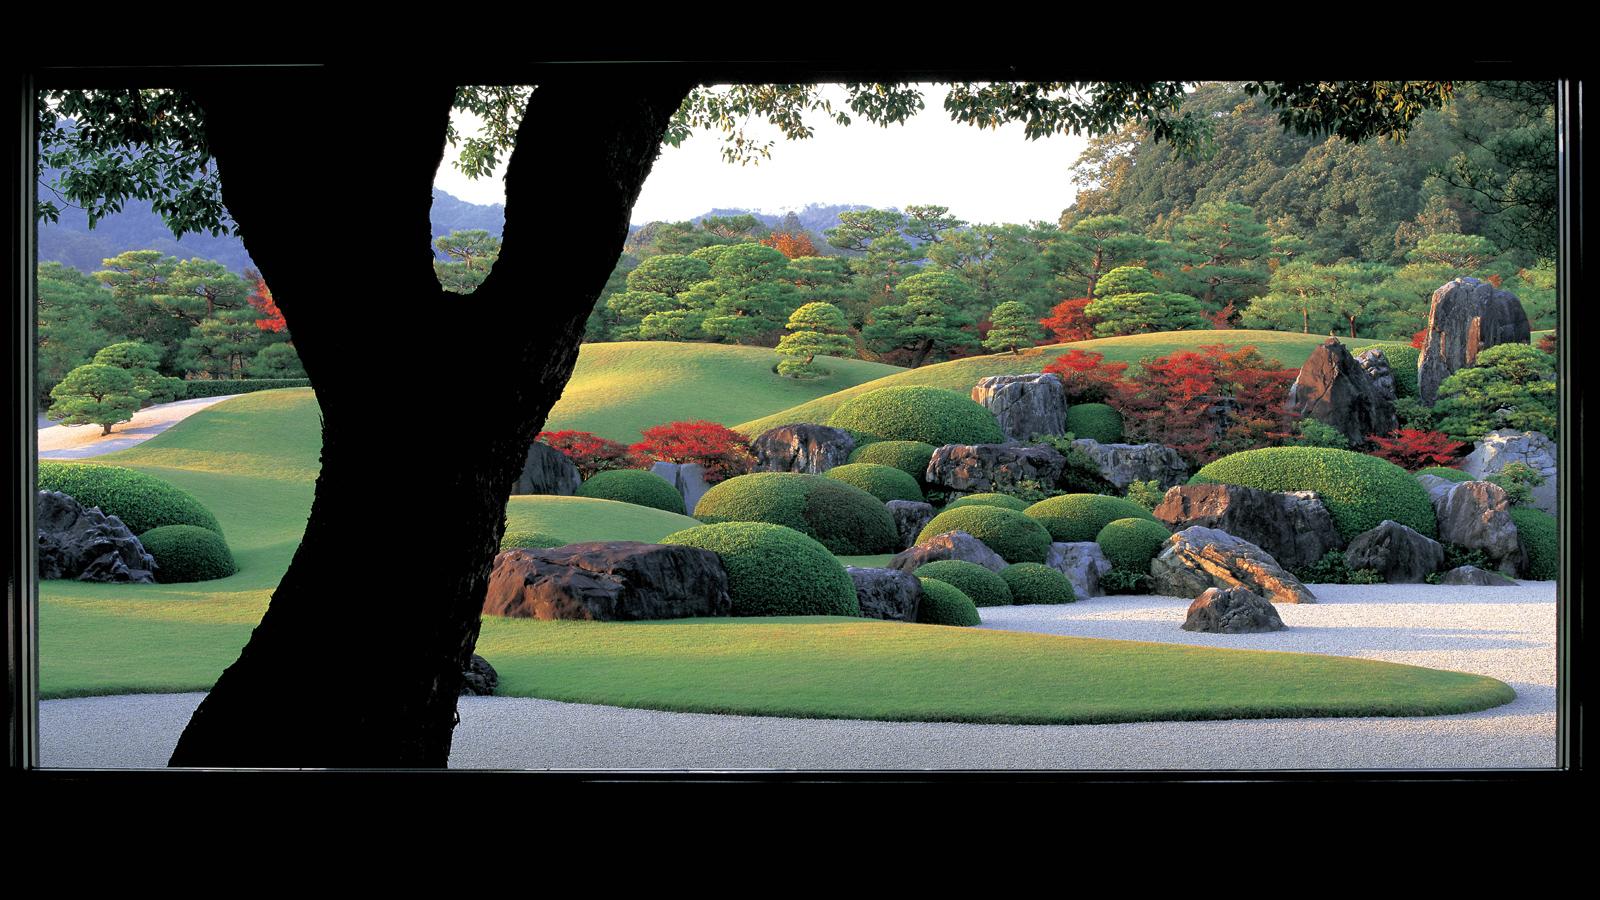 【GoToトラベル支援対象】出雲大社と足立美術館 美肌の湯に泊まる2泊3日